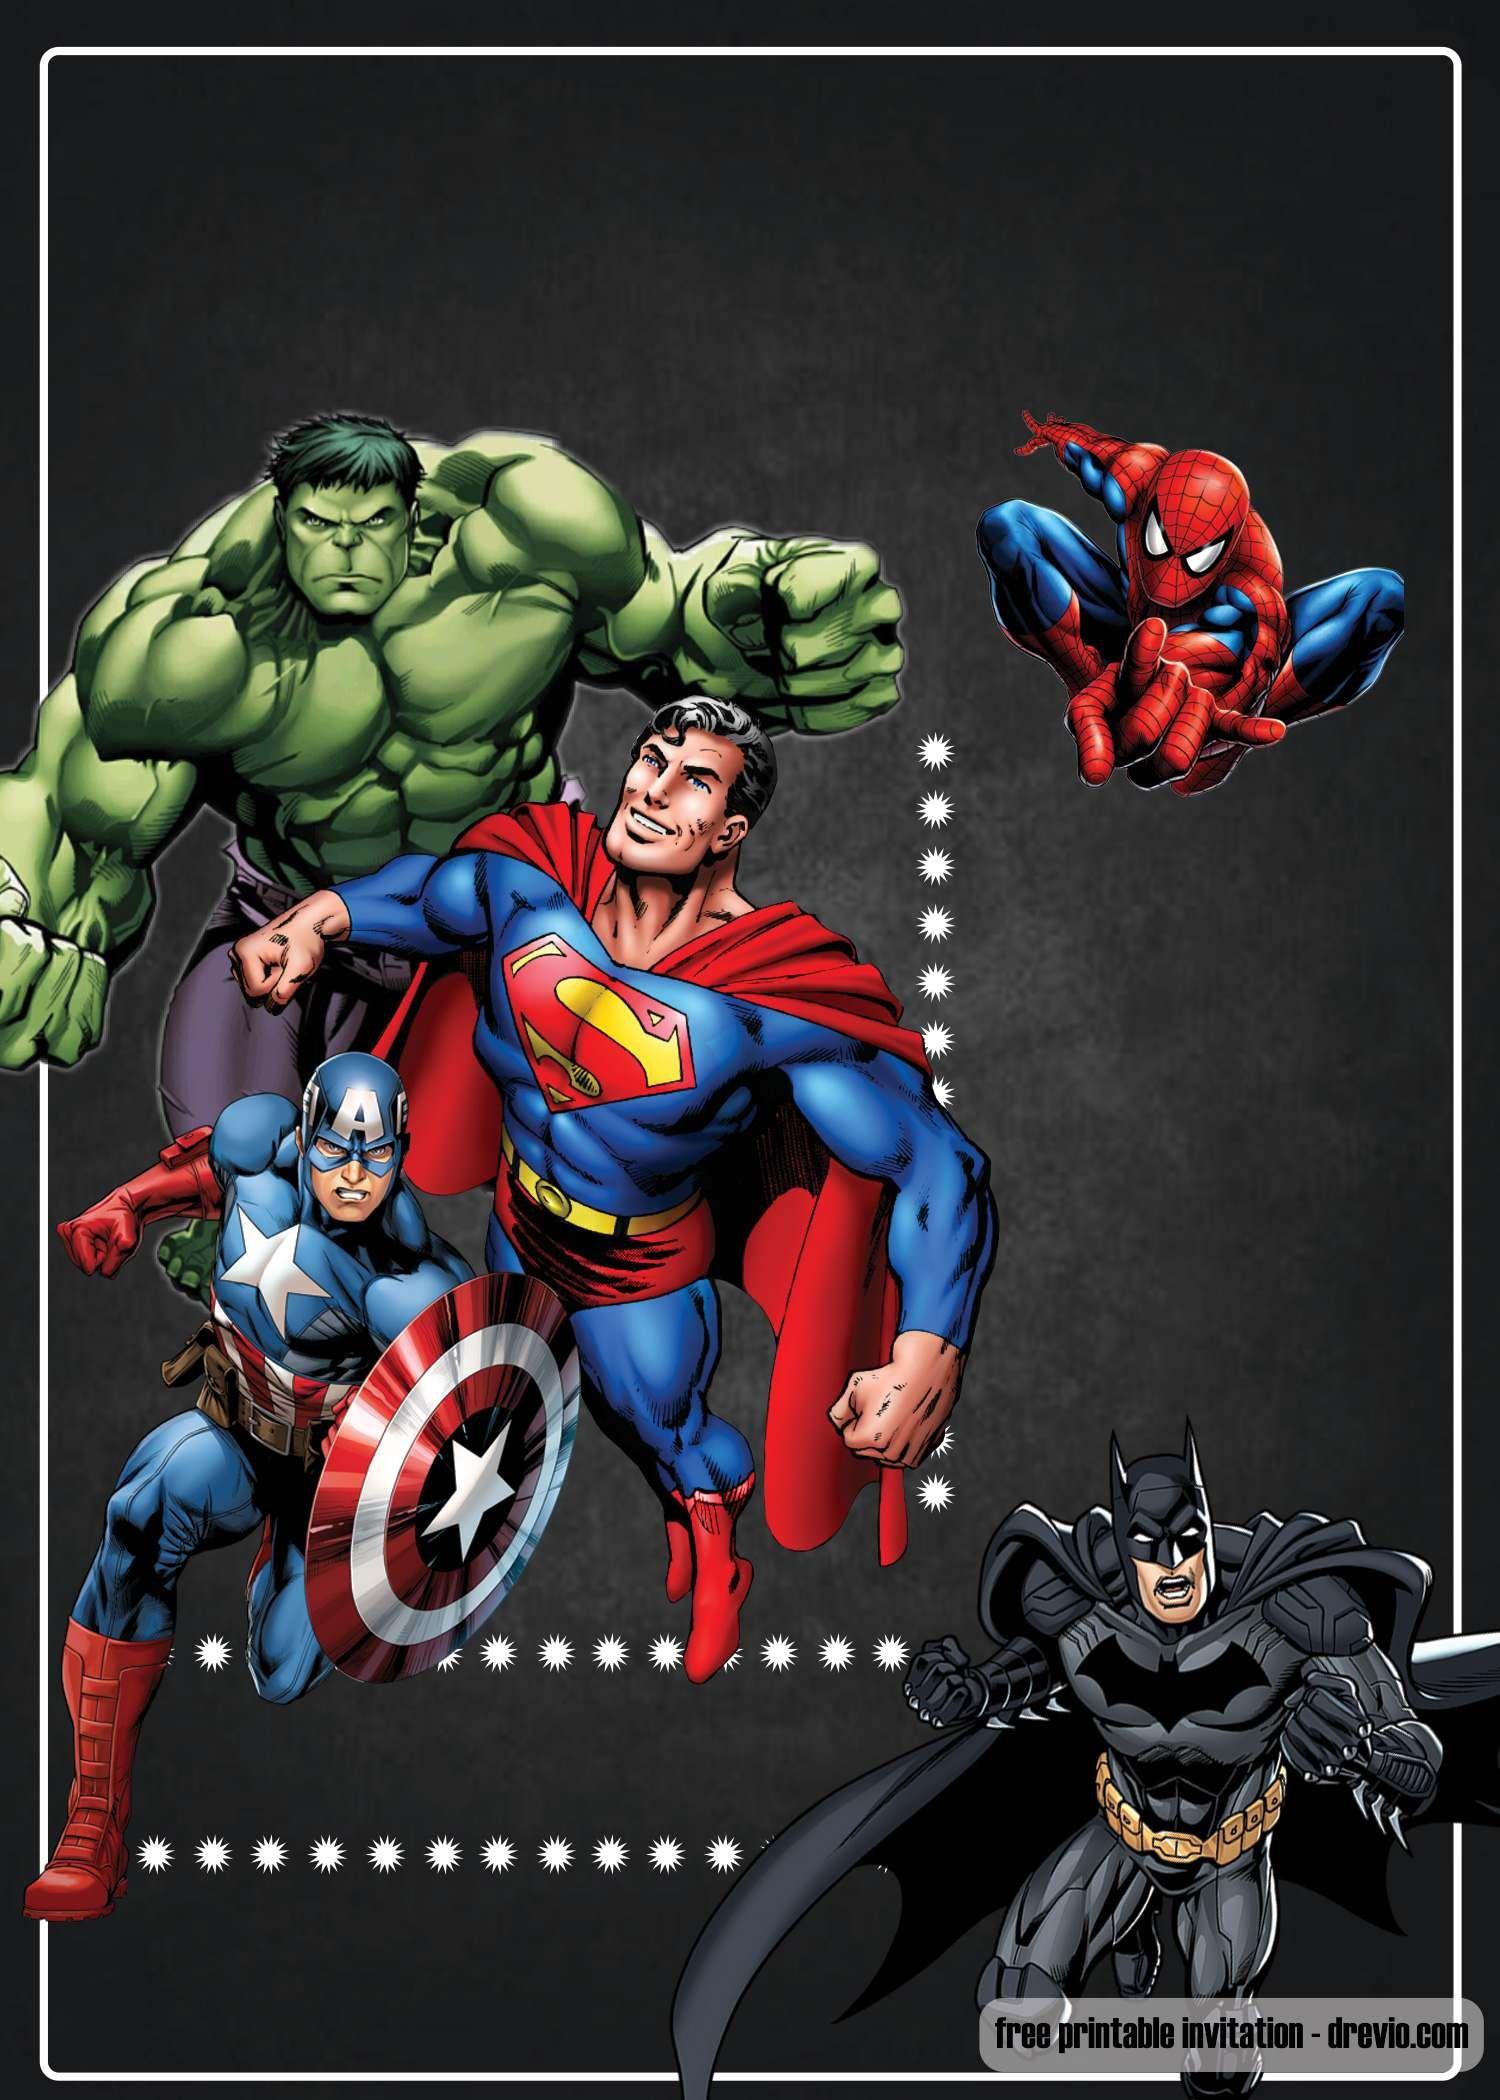 005 Unbelievable Superhero Birthday Party Invitation Template Free High Resolution  InviteFull